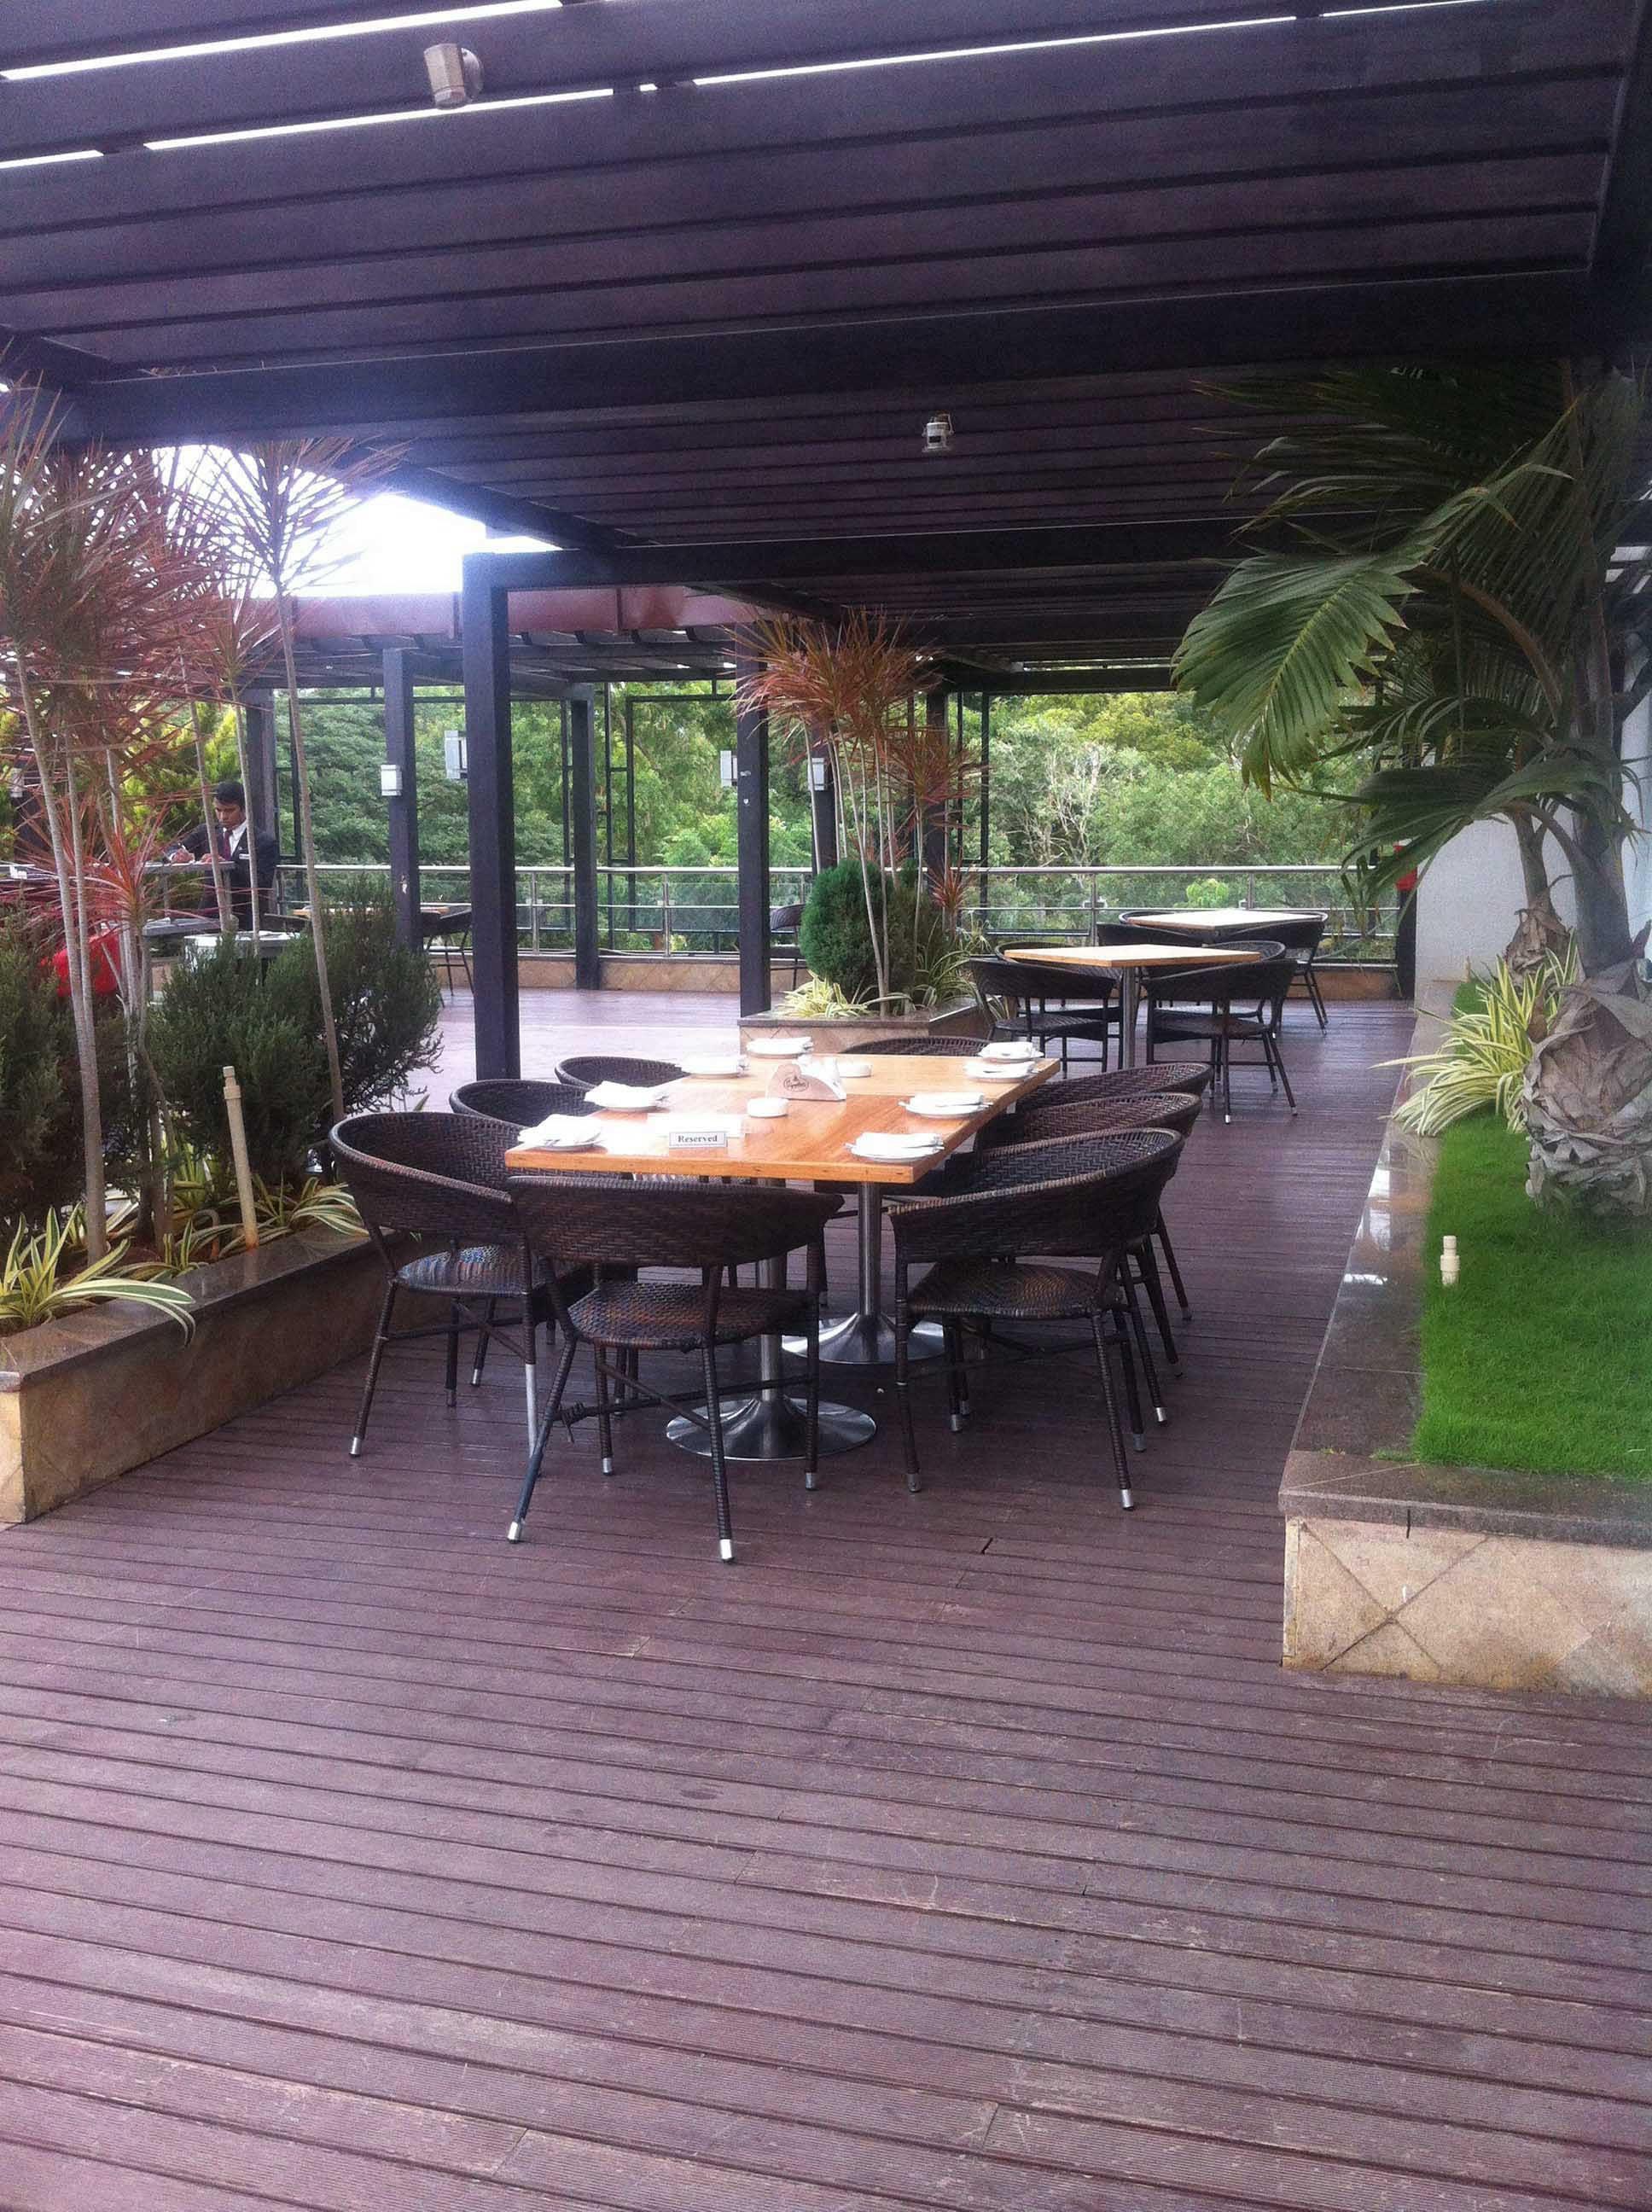 Pool Bar & Grill - Jayalakhsmipuram - Mysore Image